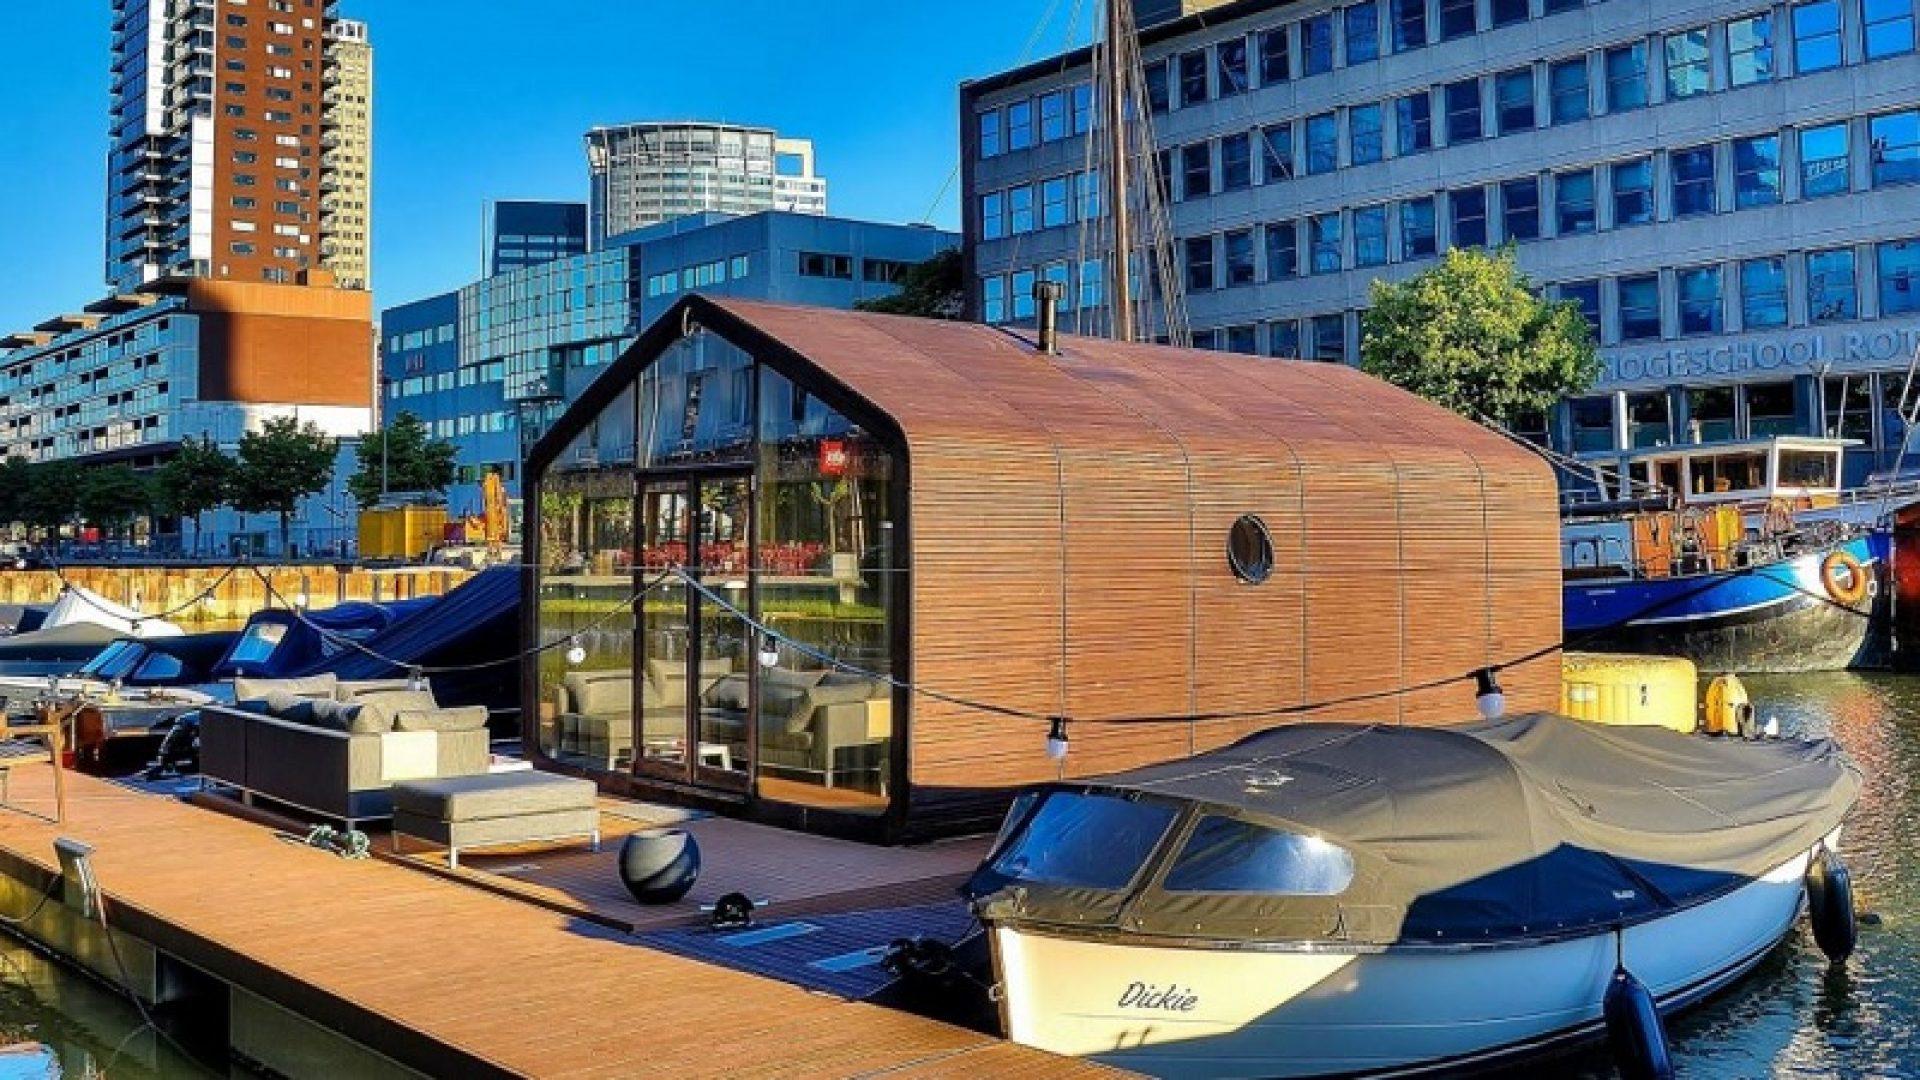 De Wikkelboat